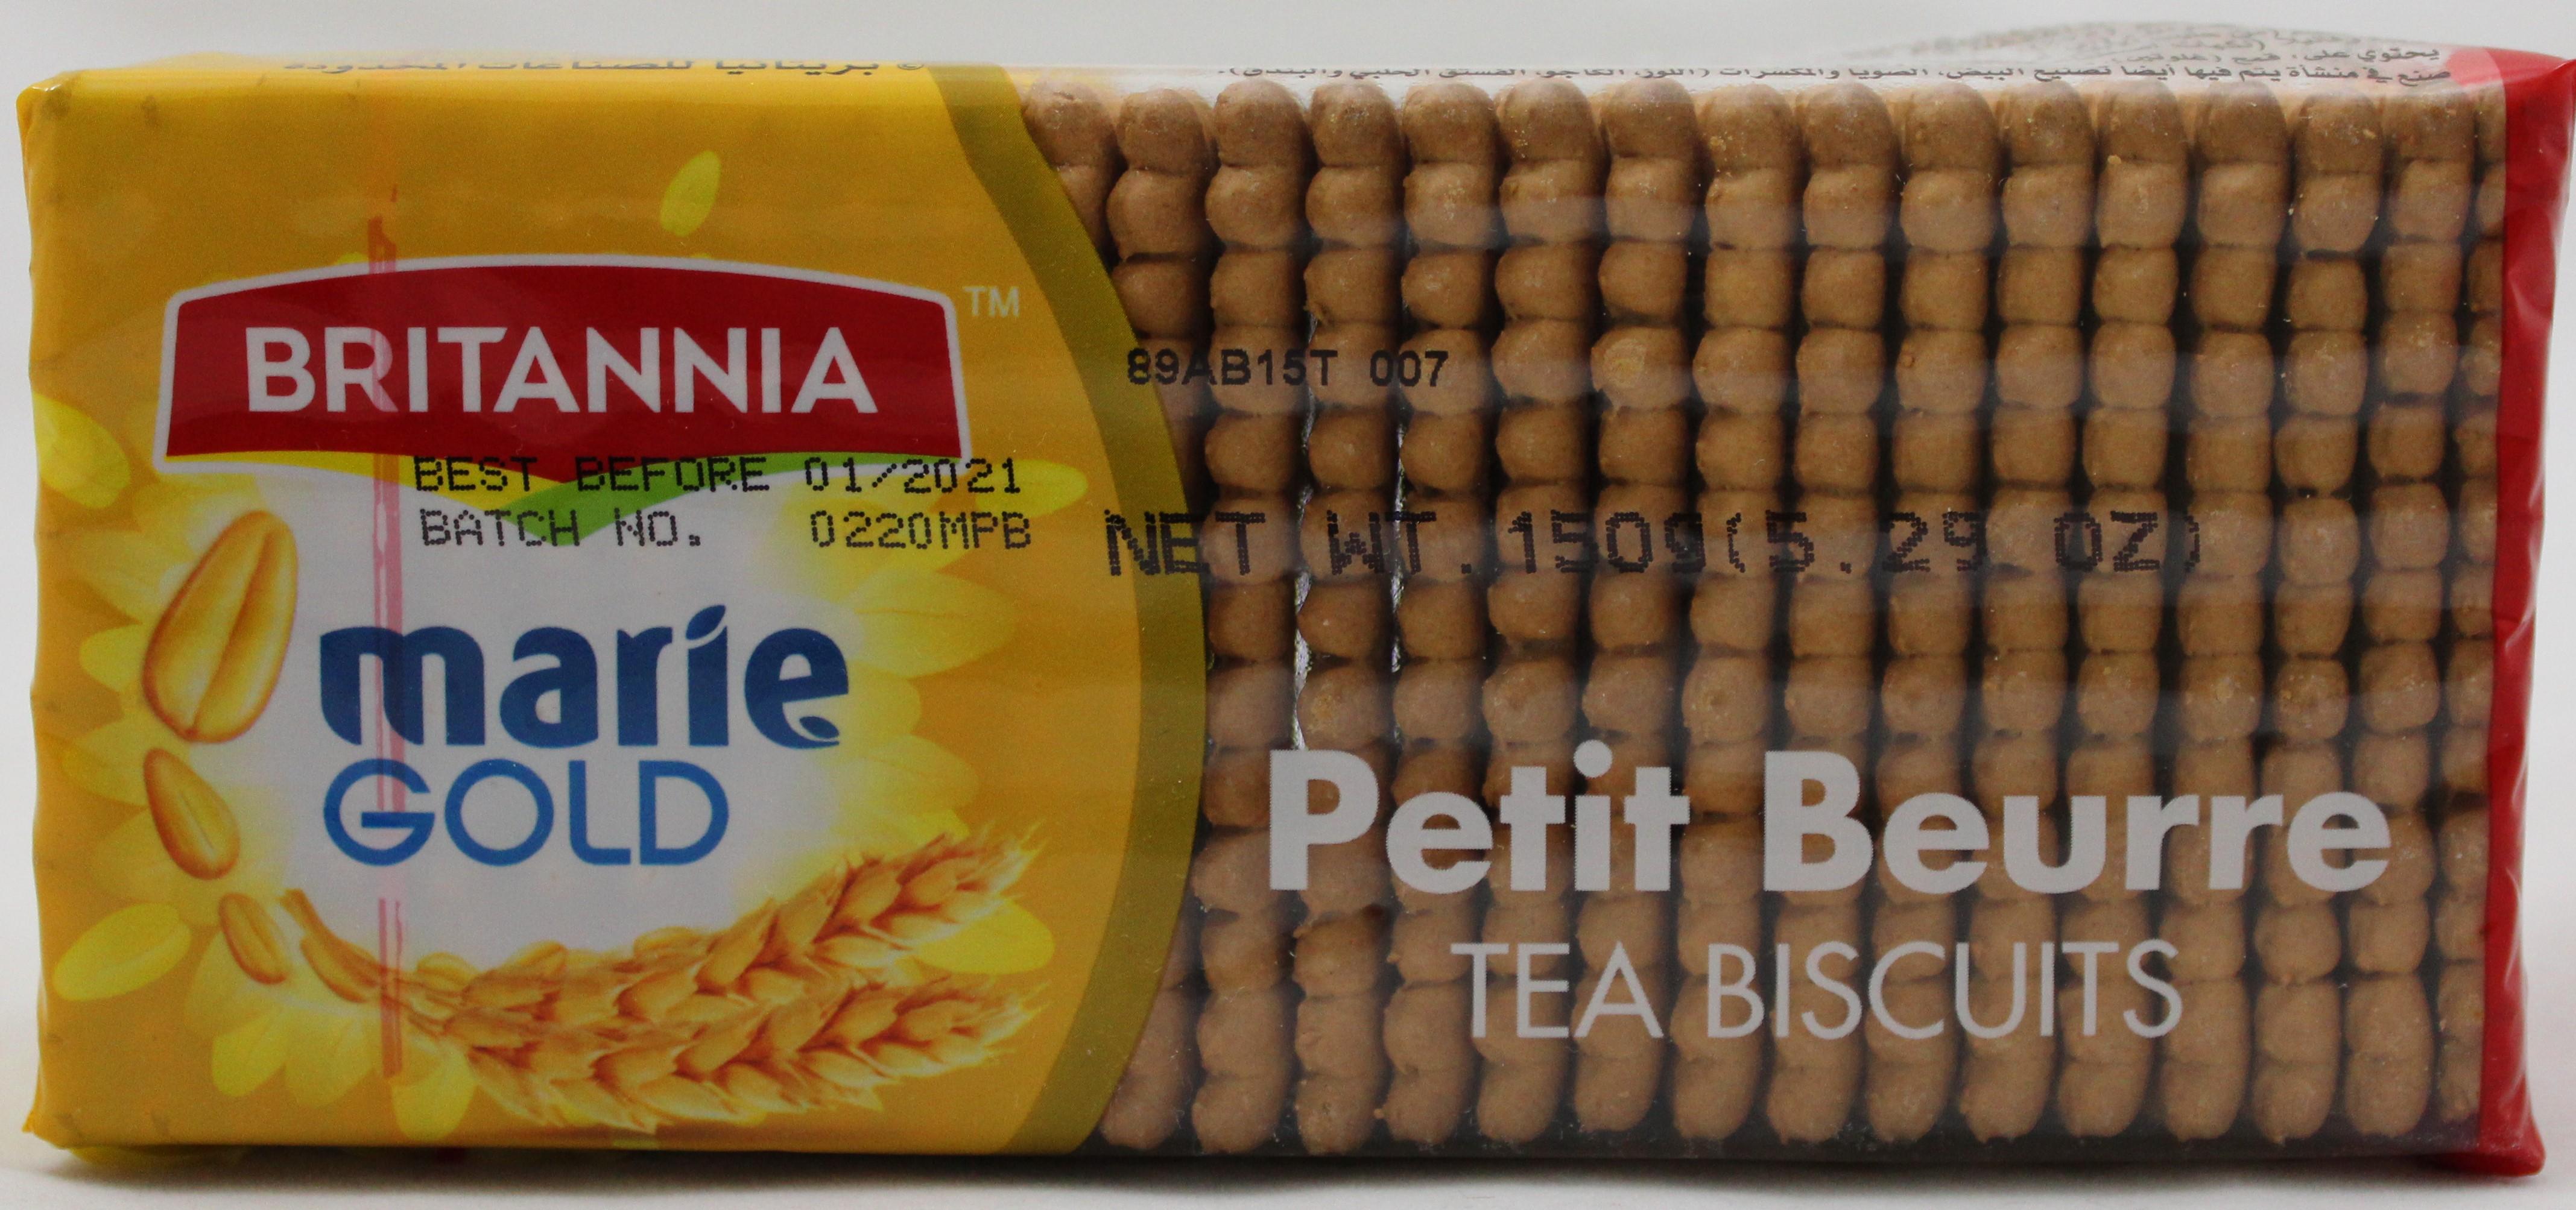 MarieGold Petit Beurre 5.3Oz